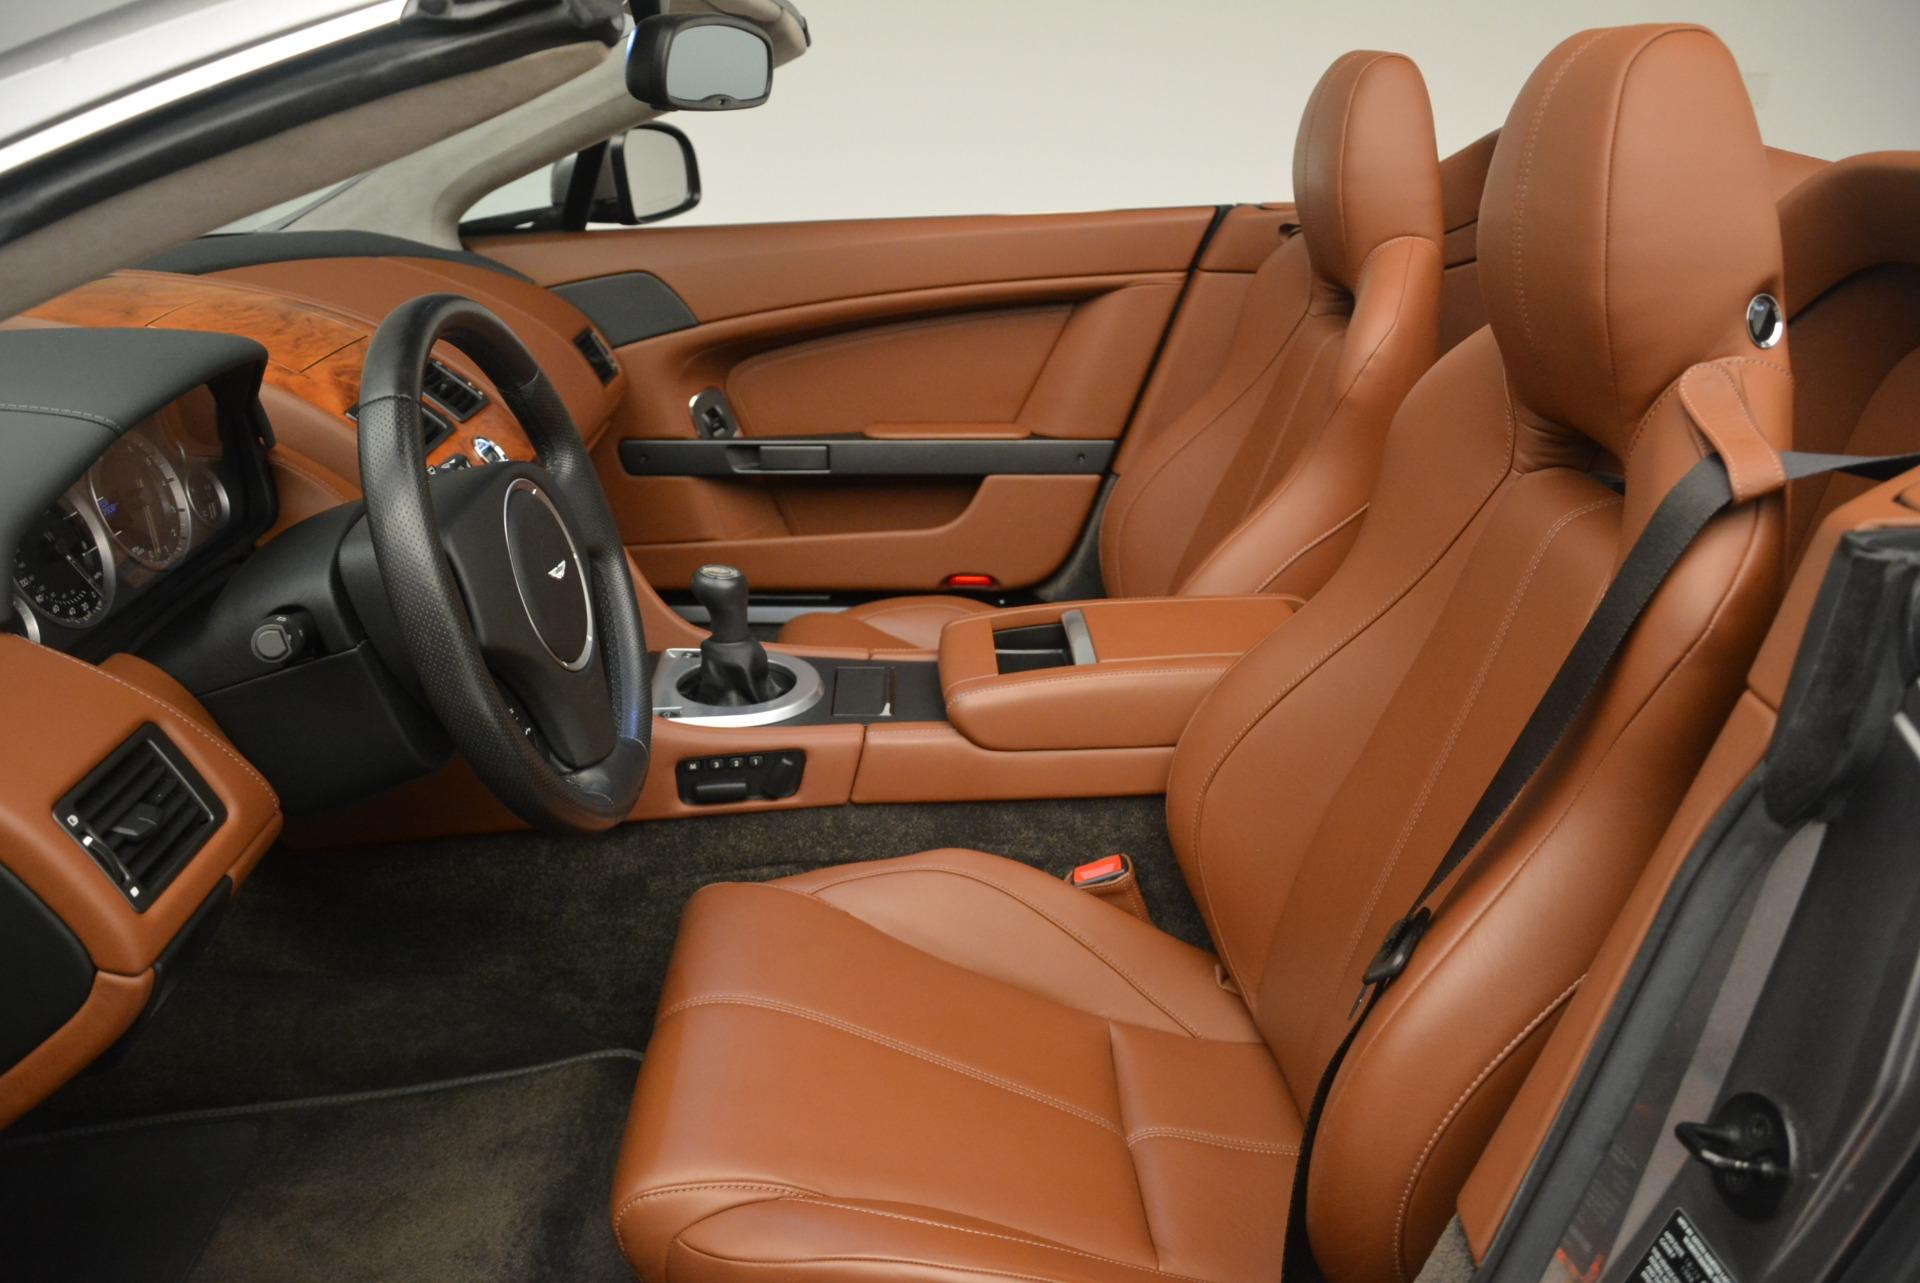 Used 2015 Aston Martin V8 Vantage Roadster For Sale In Westport, CT 2463_p19